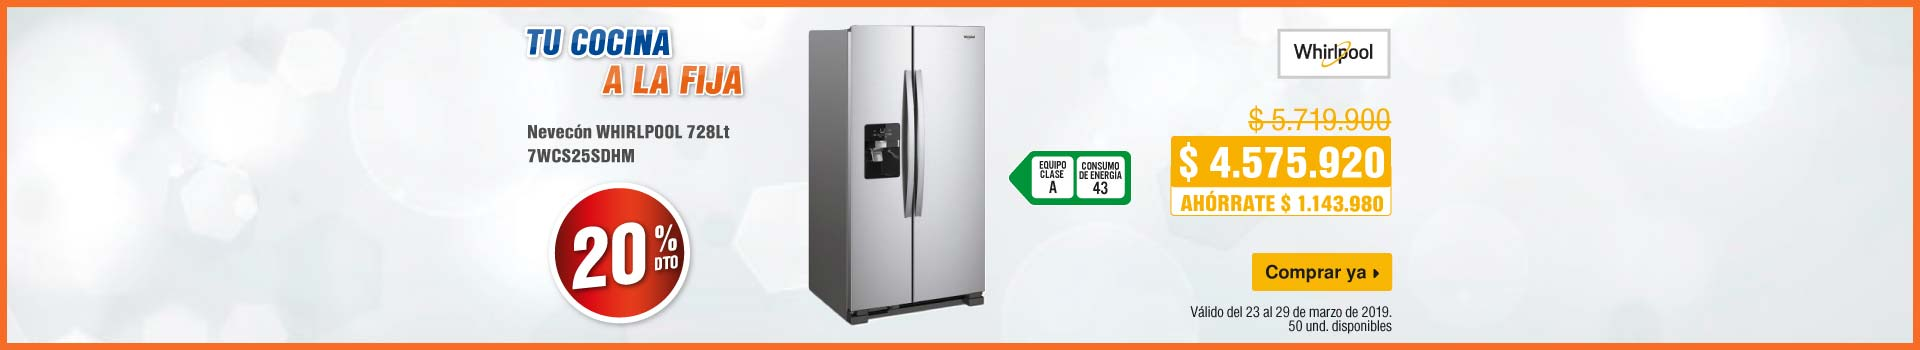 AK-KT-mayores-2-ELECT-BCAT-refrigeracion-WHIRLPOOL-230319